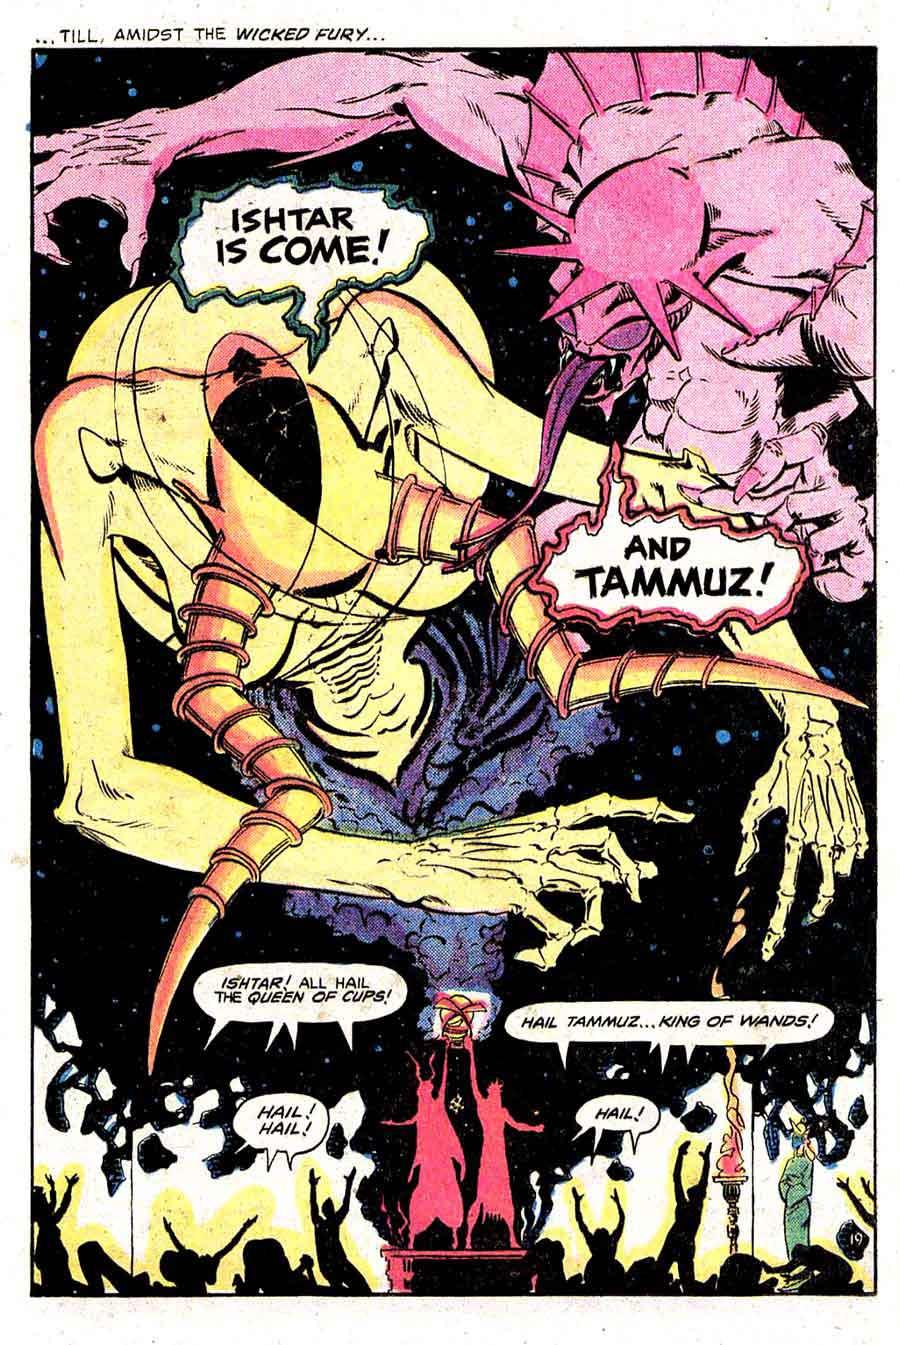 Madame Xanadu v1 #1 - Marshall Rogers 1970s dc horror comic book page art